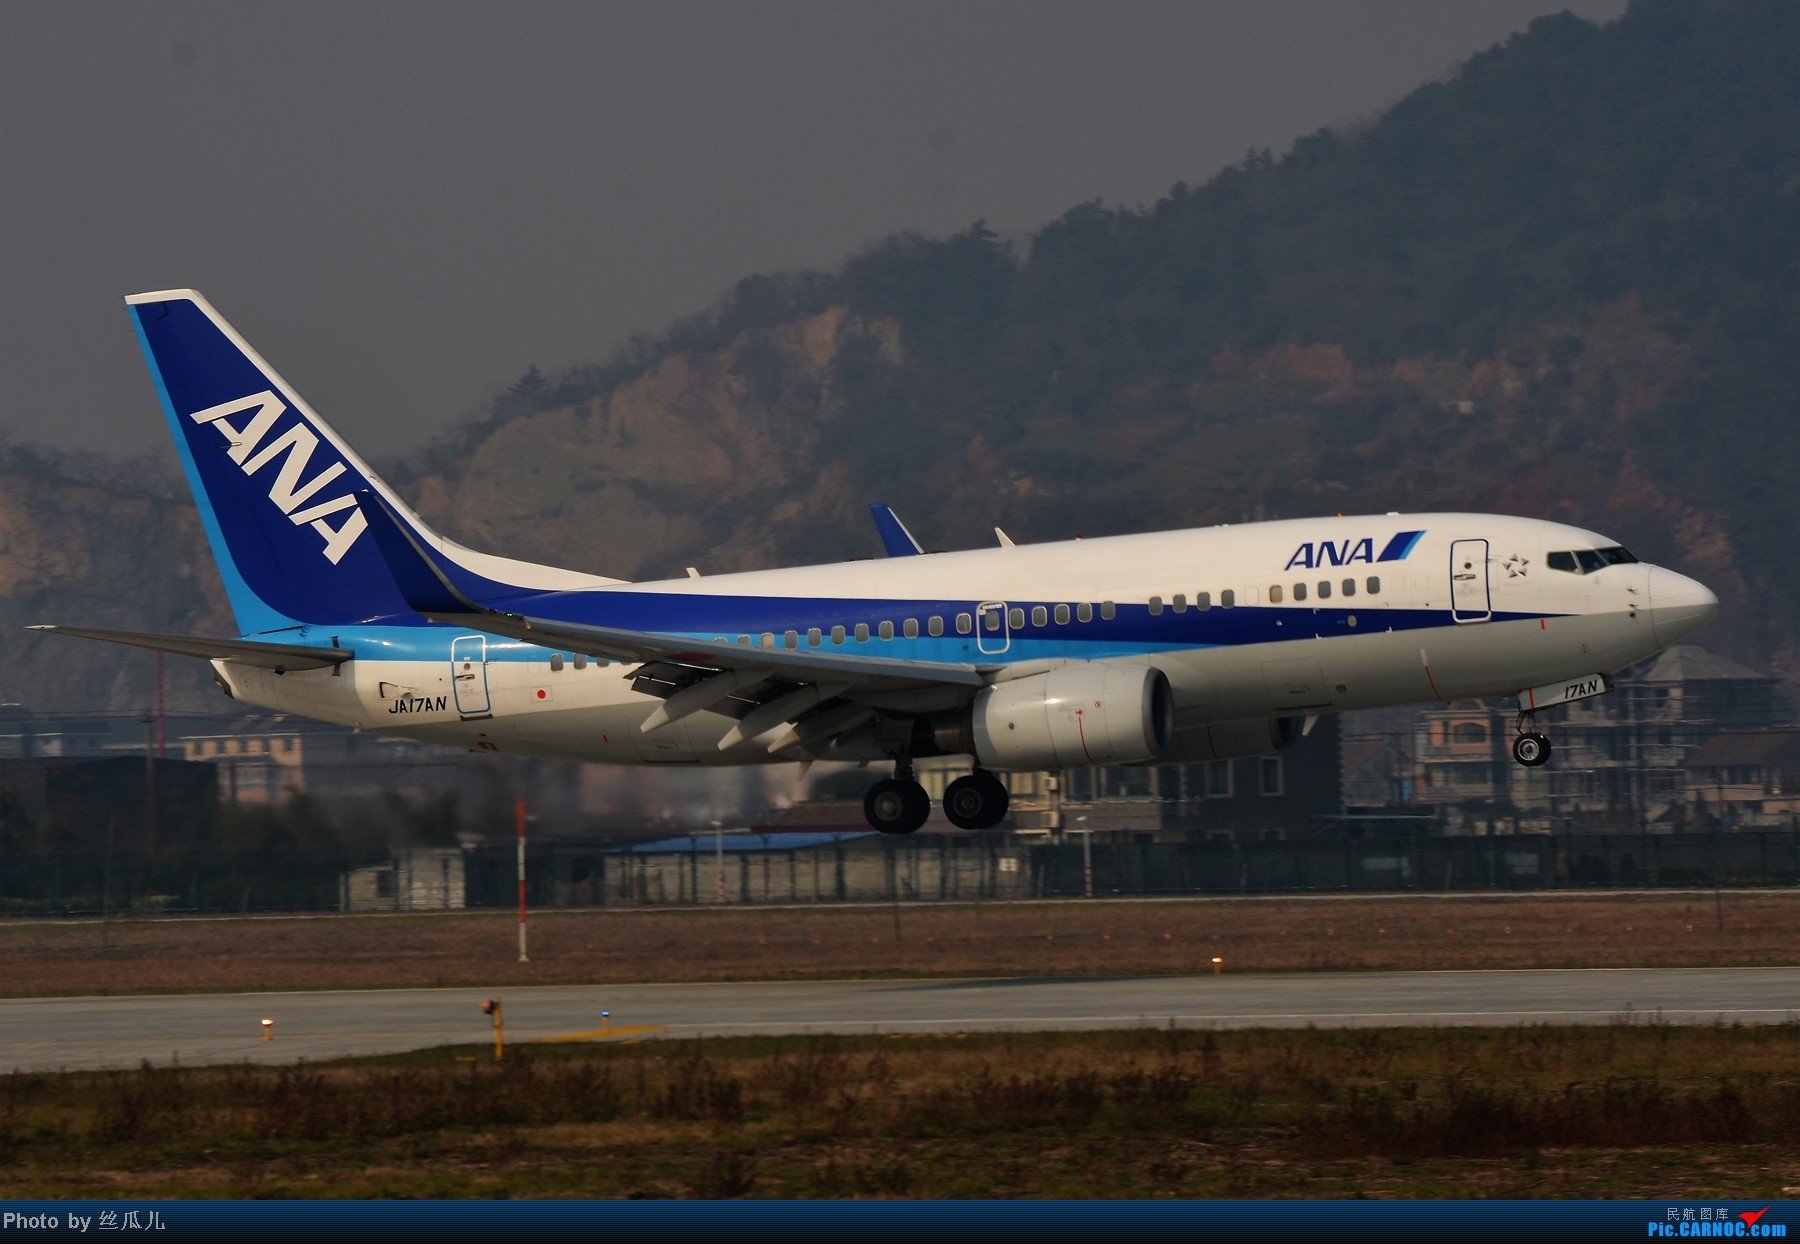 Re:[原创]【HGH二跑】话说如今的二跑有了制高点--趁今天雾霾好转一点赶紧去练练甩腰--今日中午二跑拍机一小时全记录 BOEING 737-781(WL) JA17AN 中国杭州萧山机场